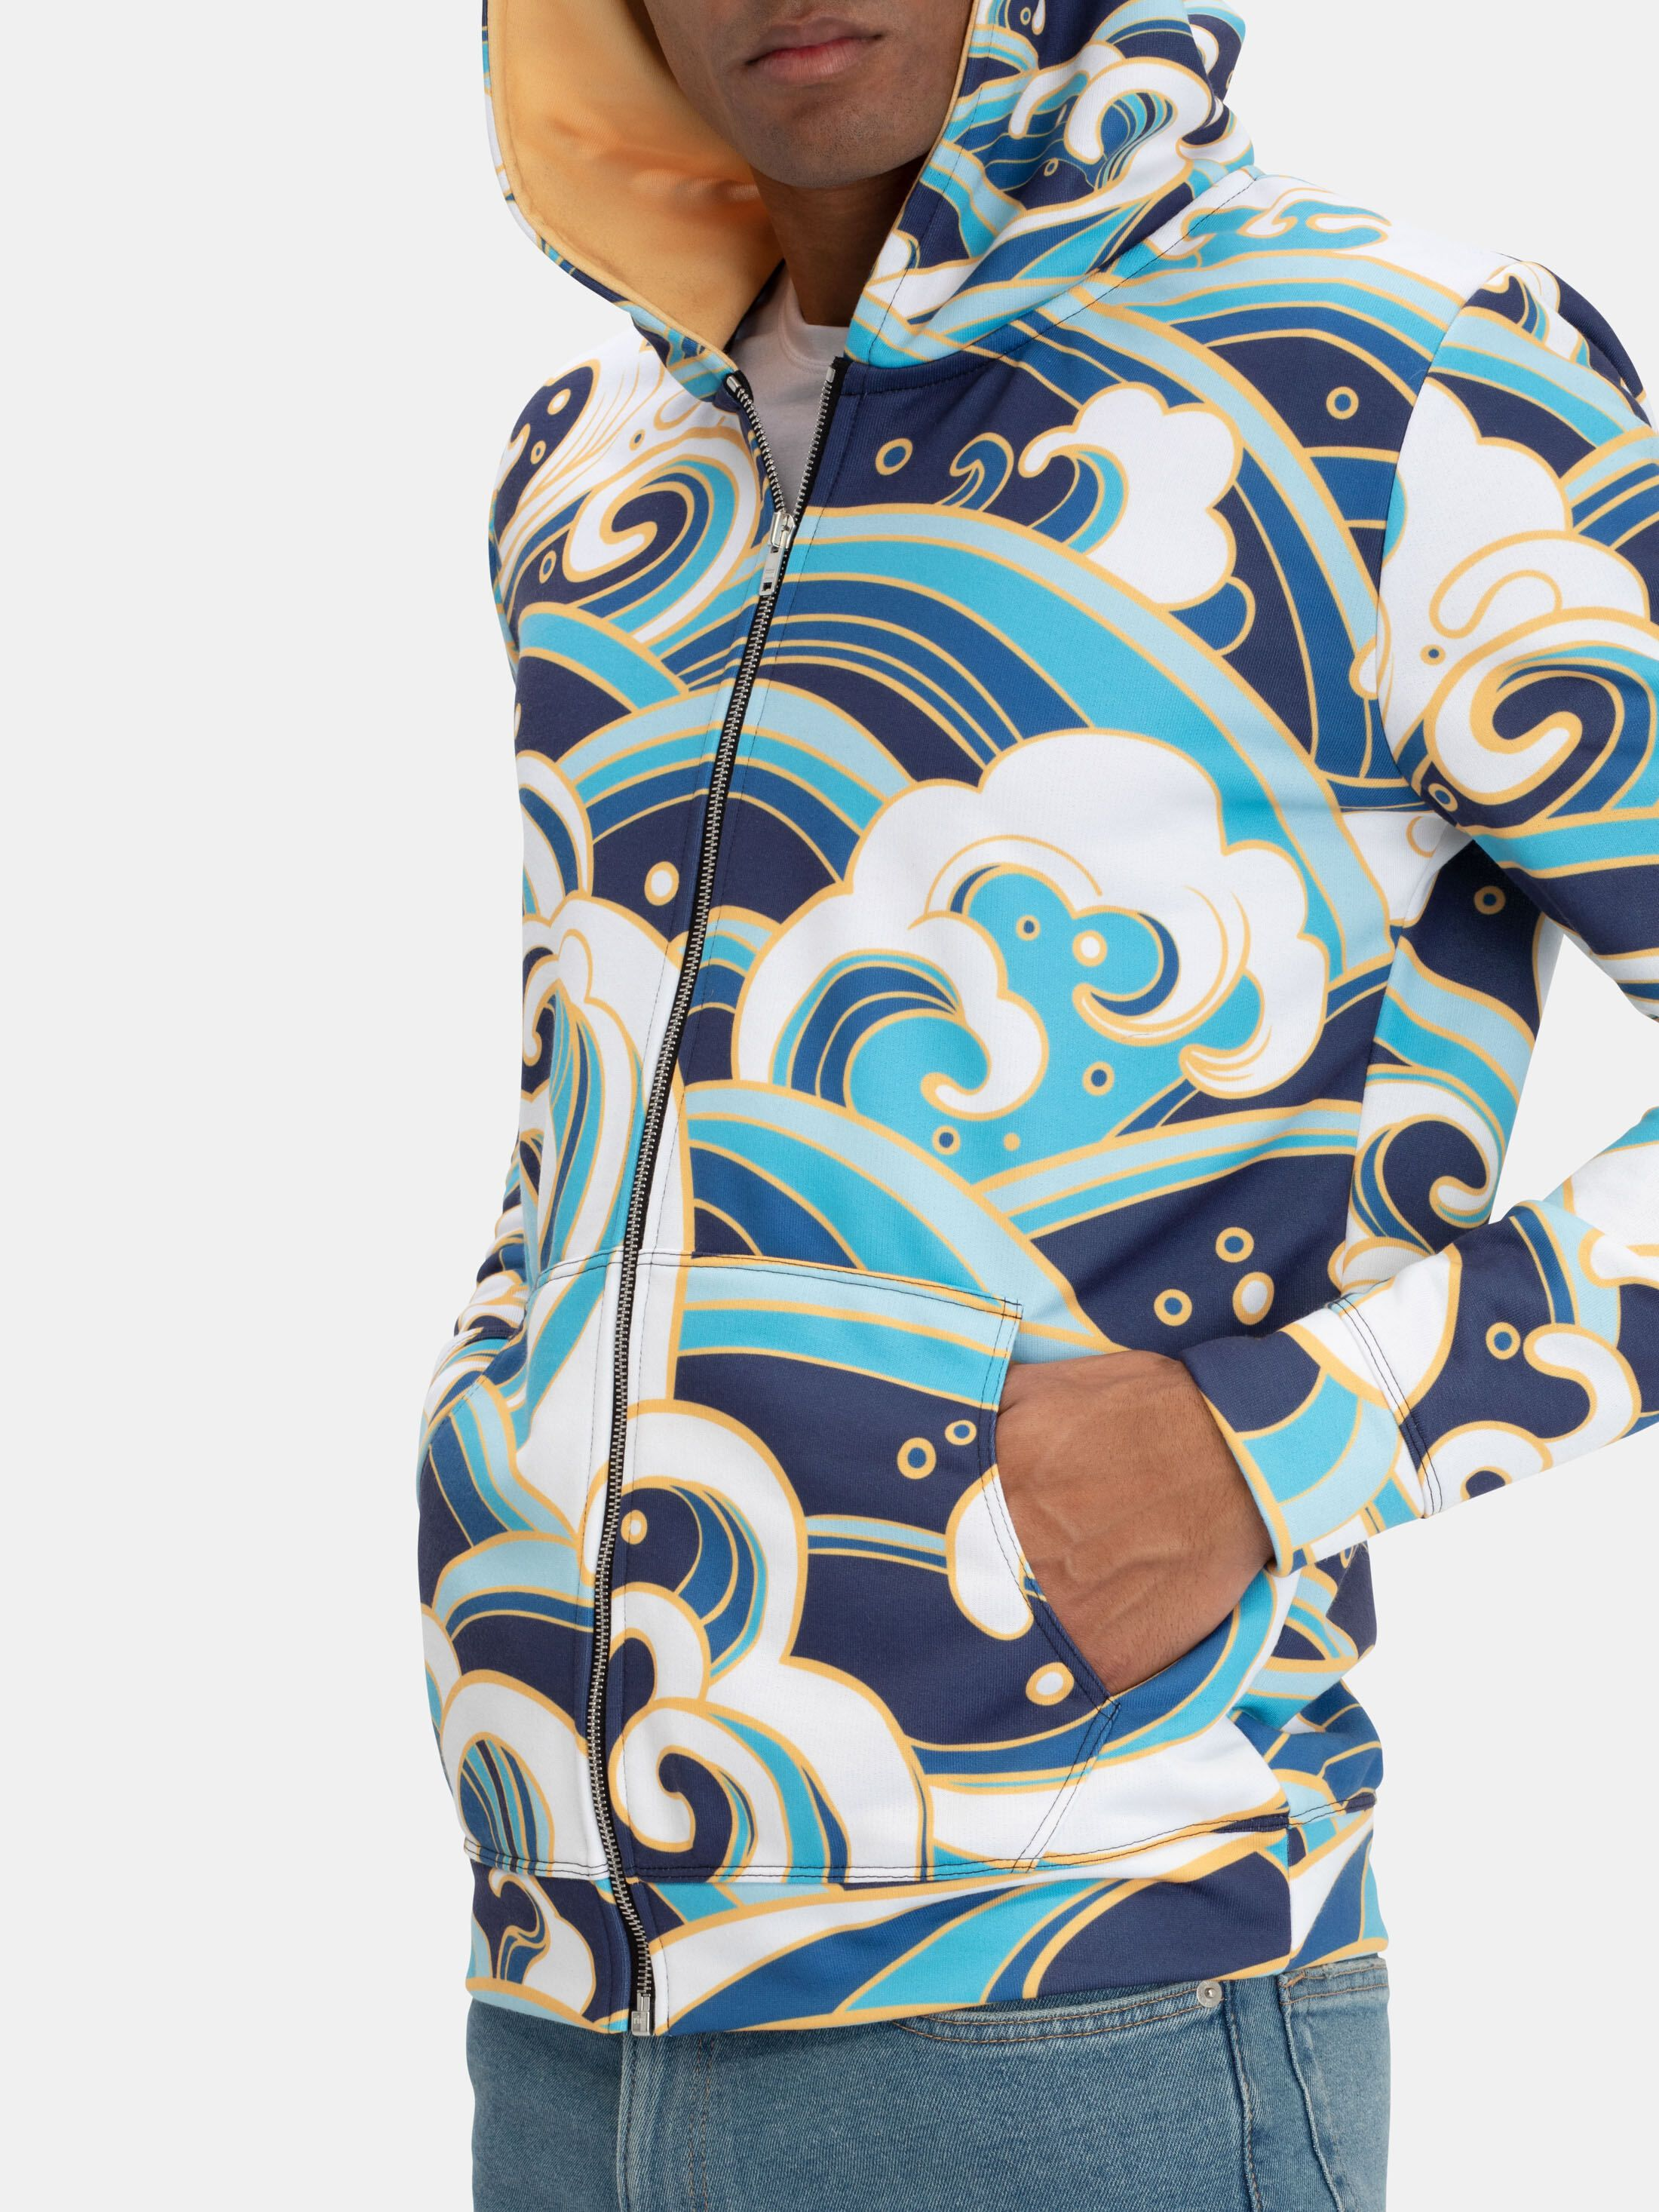 Designa hoodie online